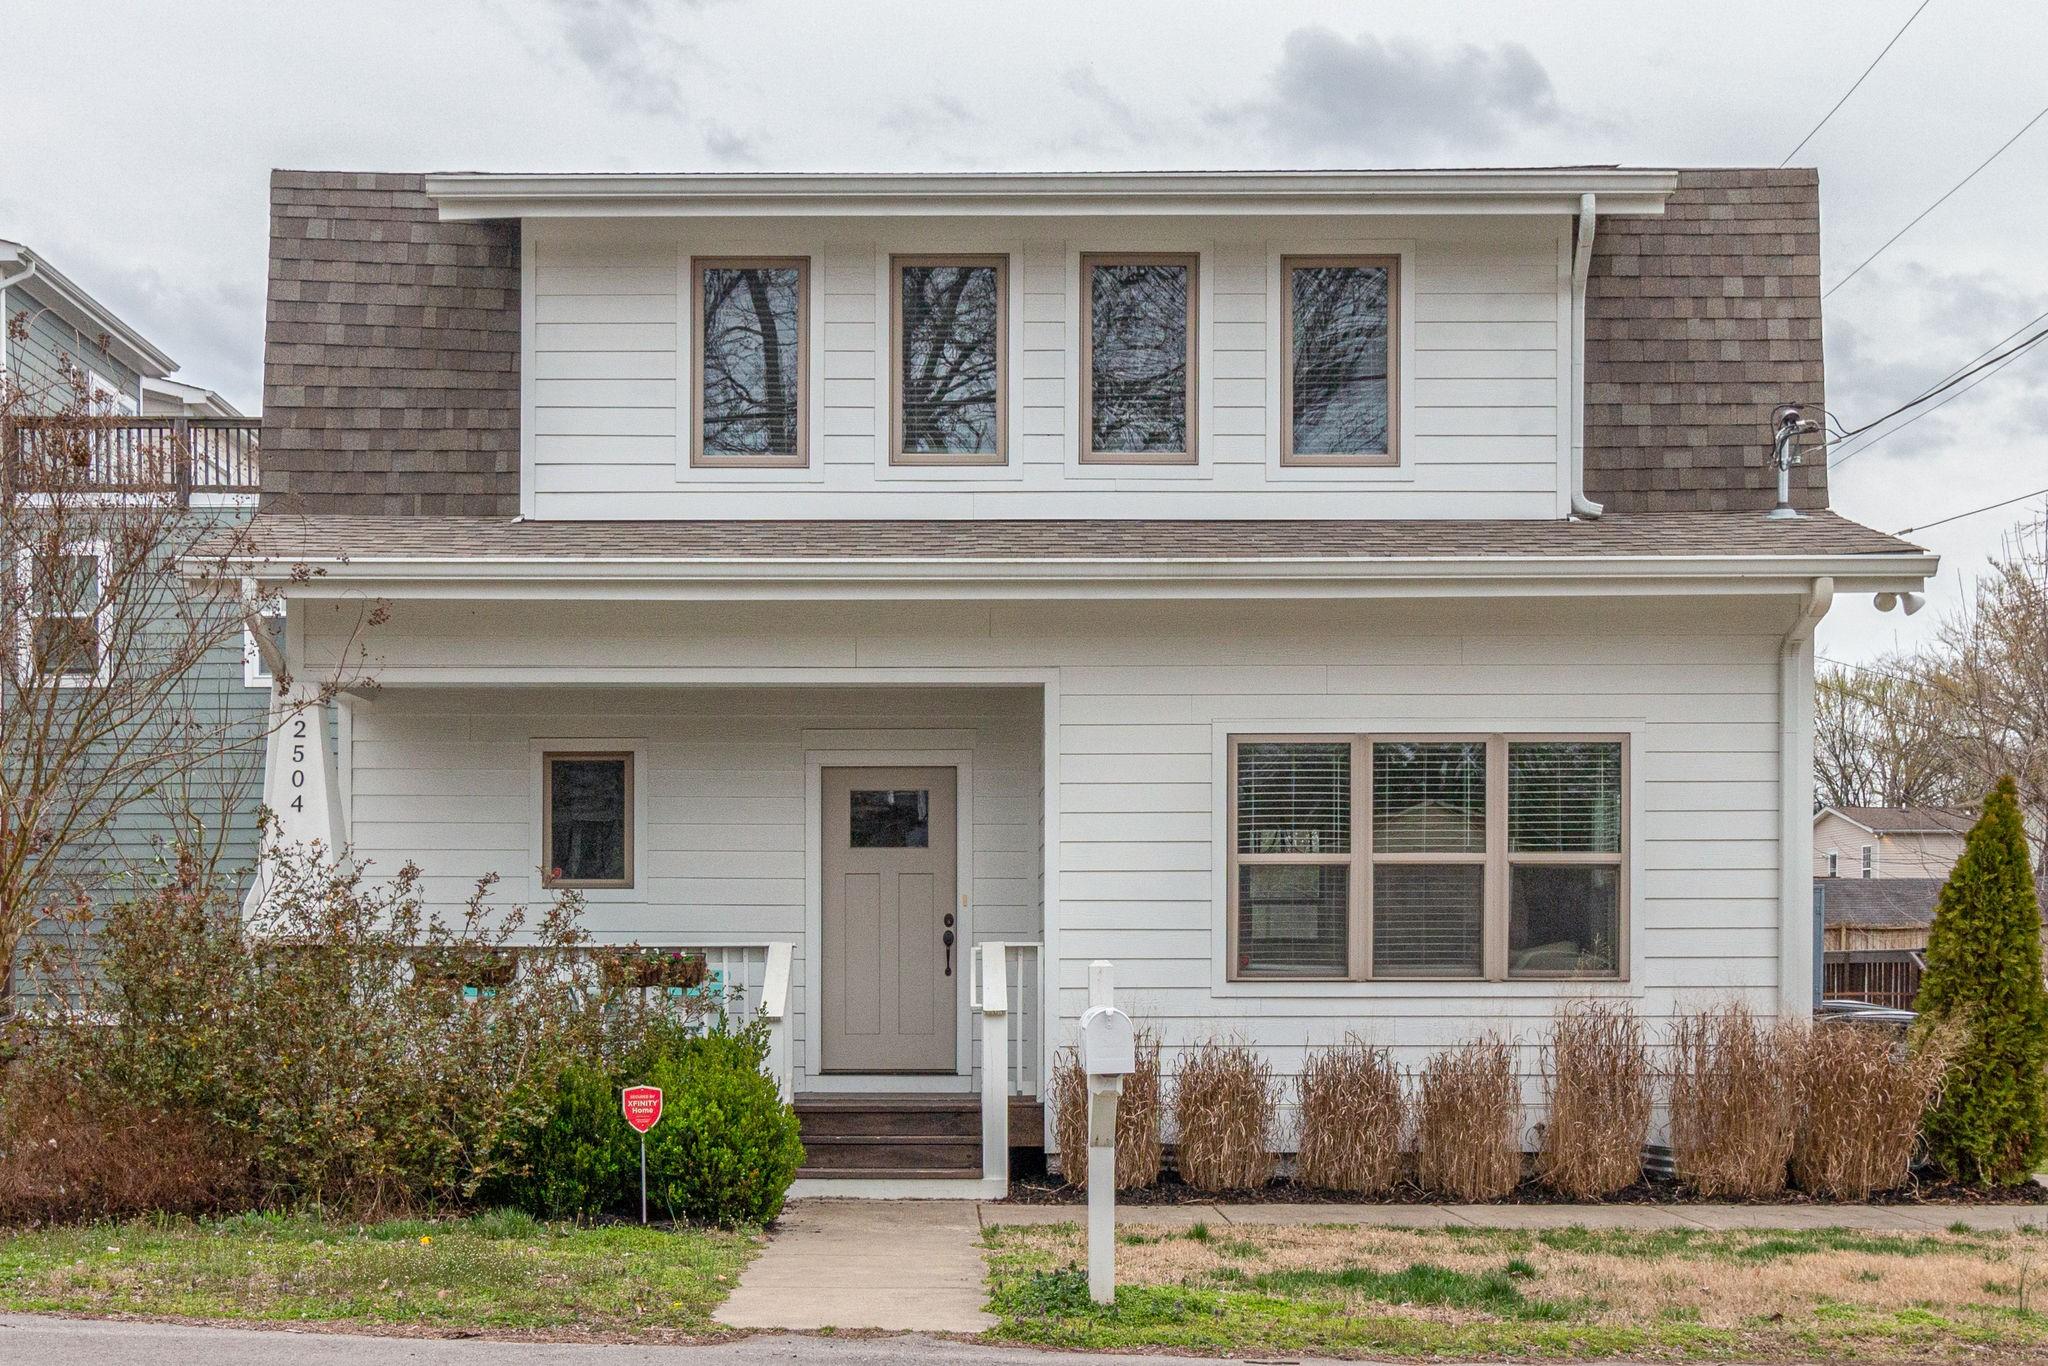 2504 Emmett Ave, Nashville, TN 37206 - Nashville, TN real estate listing